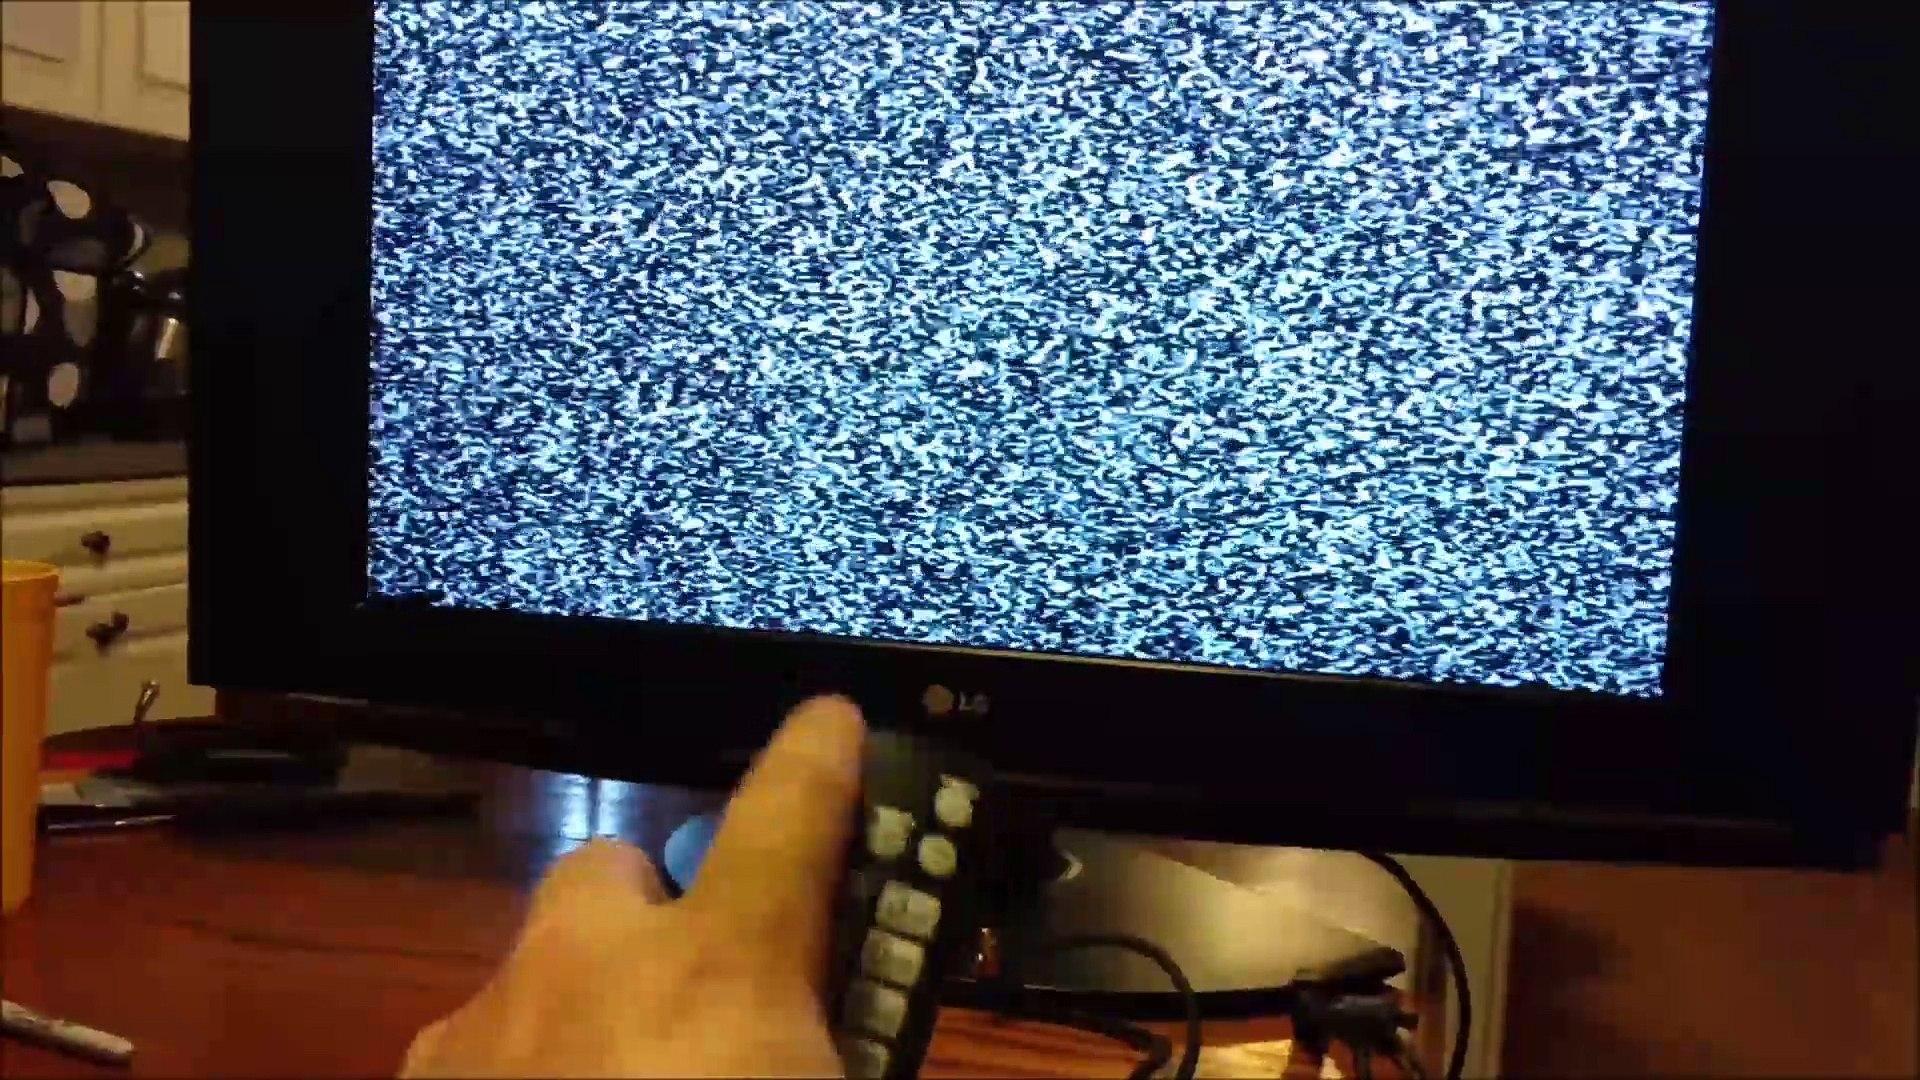 LG TV Hotel Mode Unlock - HOW TO